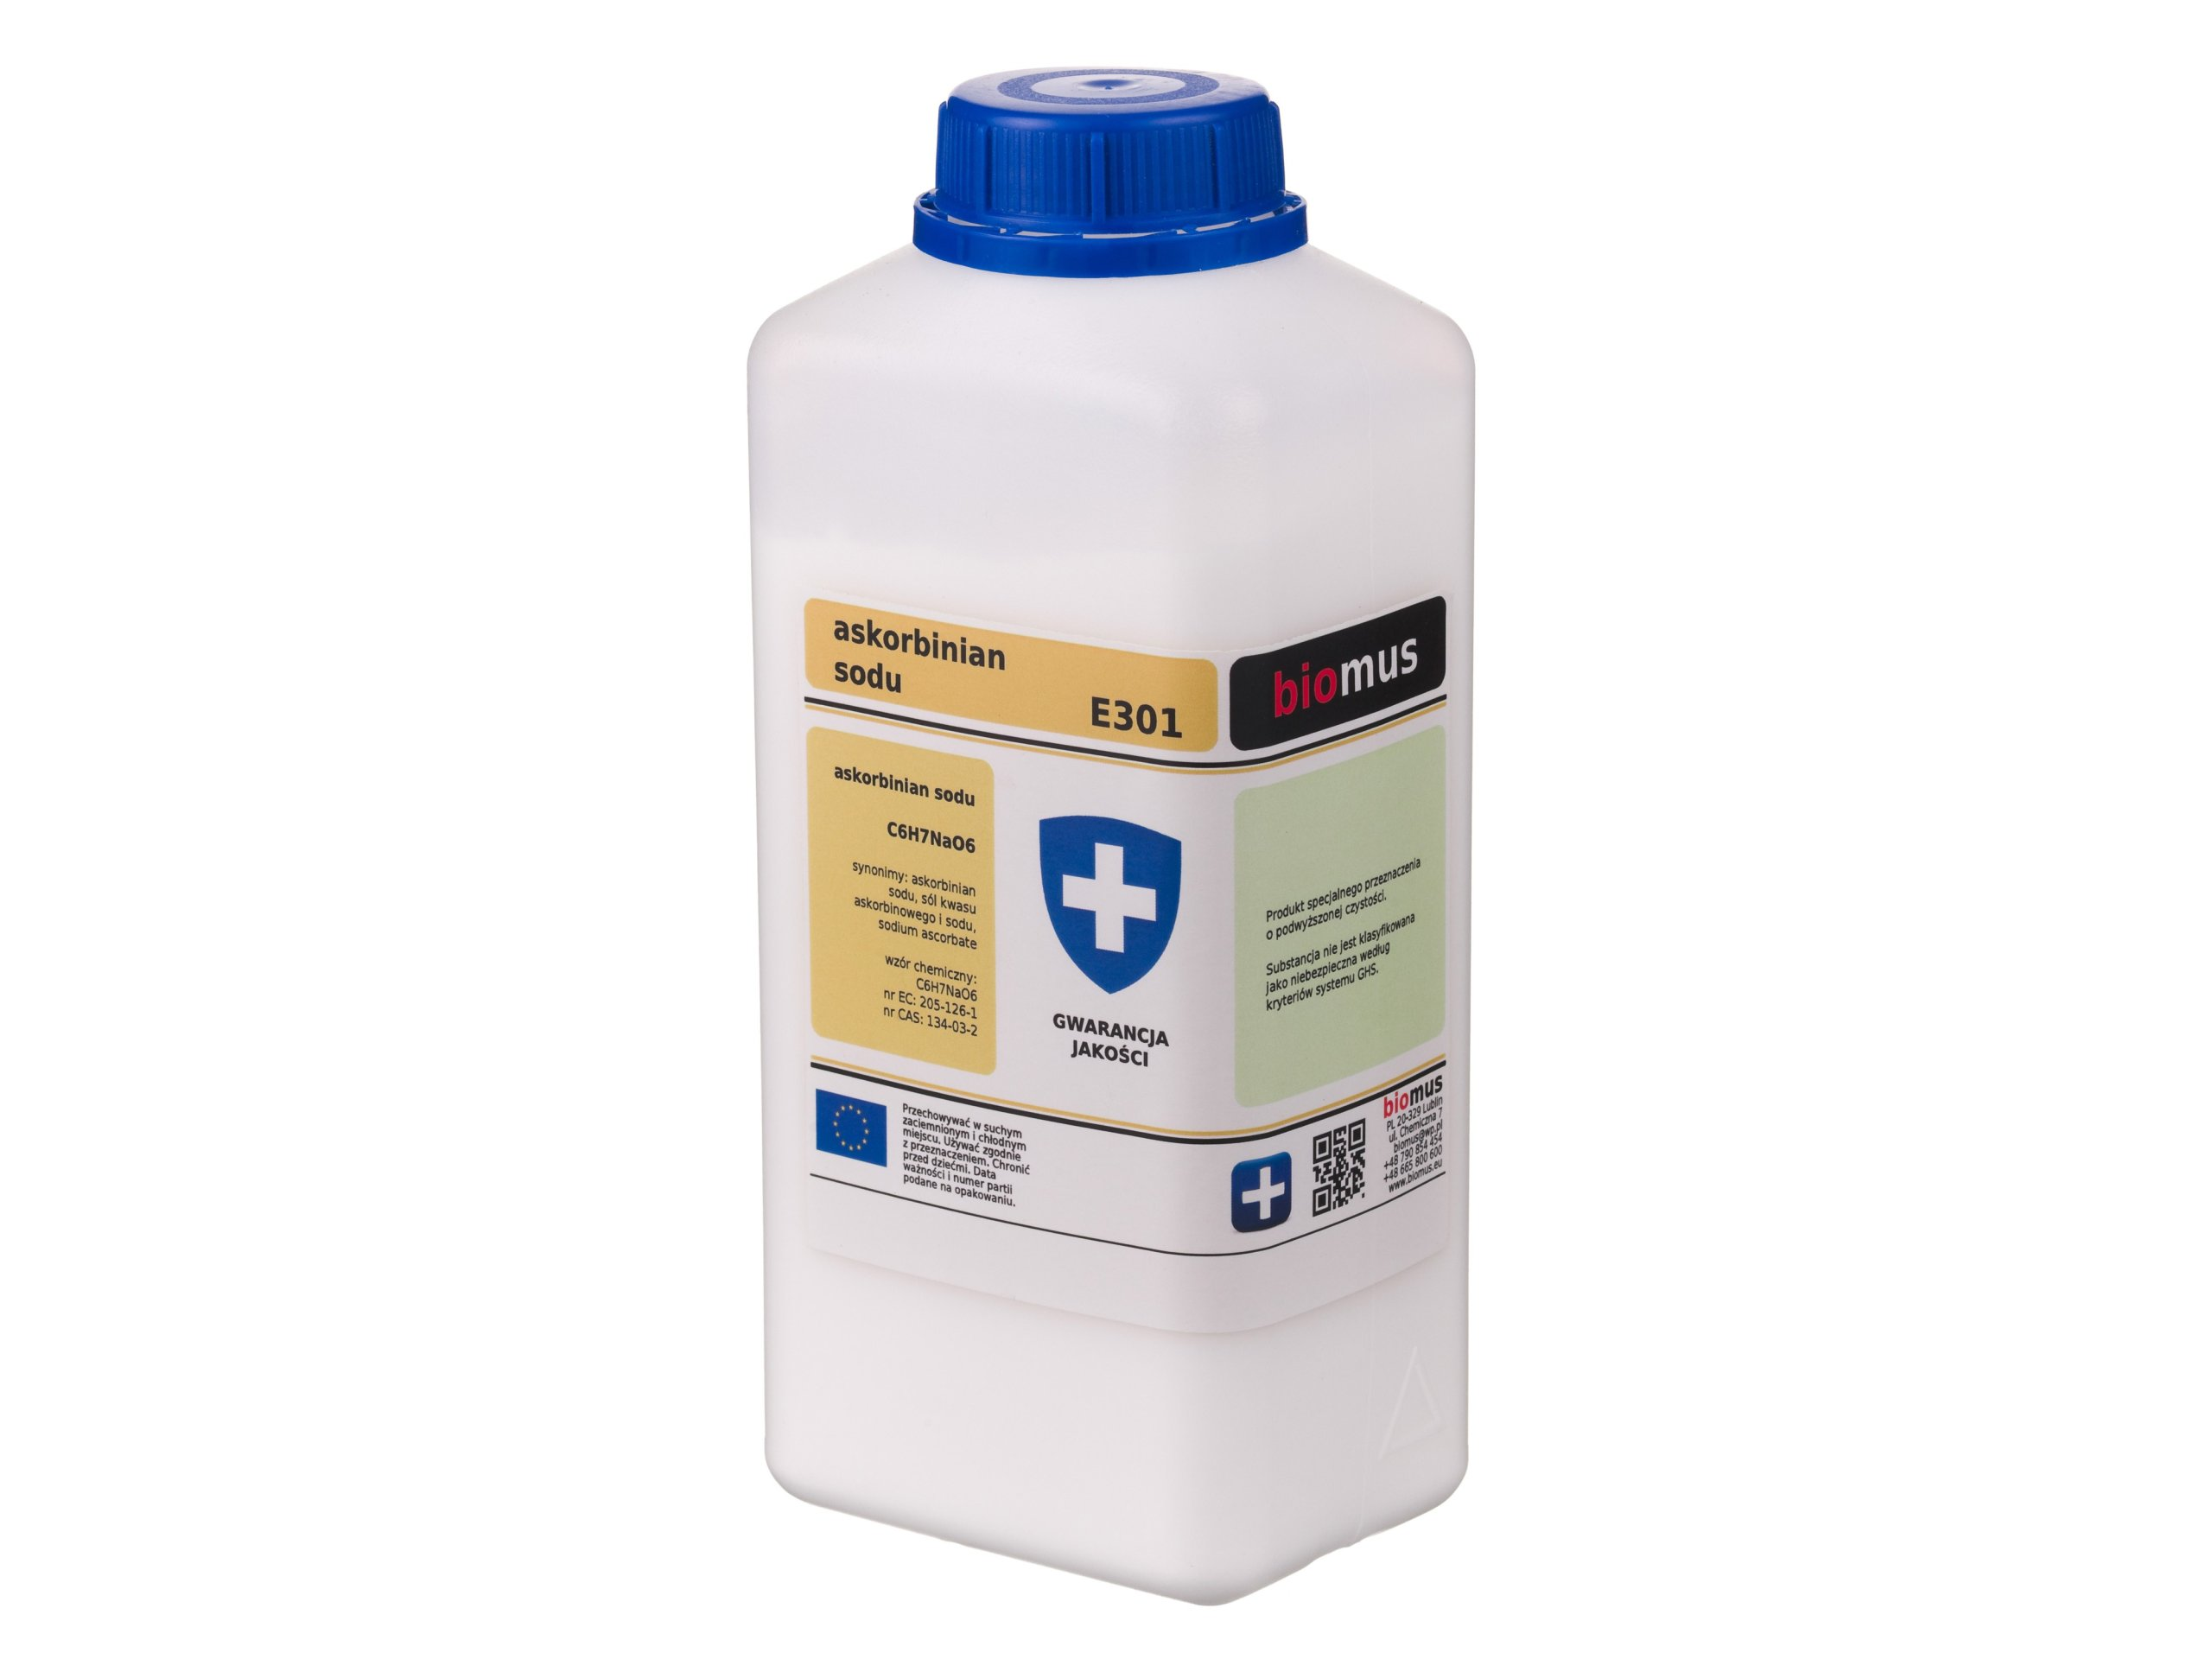 SODIUM ASCORBINATE E301 Gat чистый 1 кг биомус 1000г